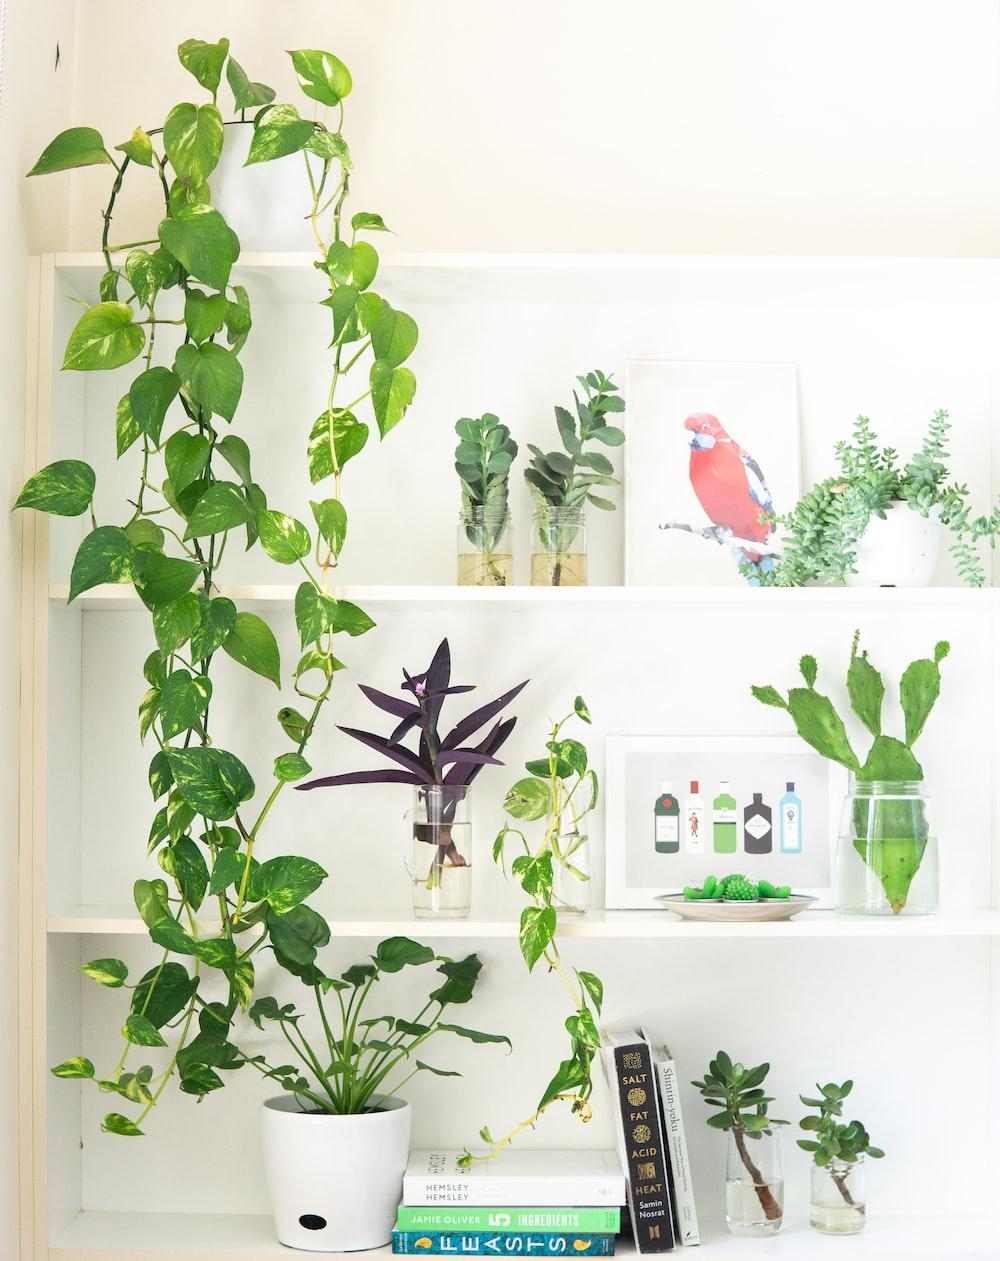 devil's ivy plant